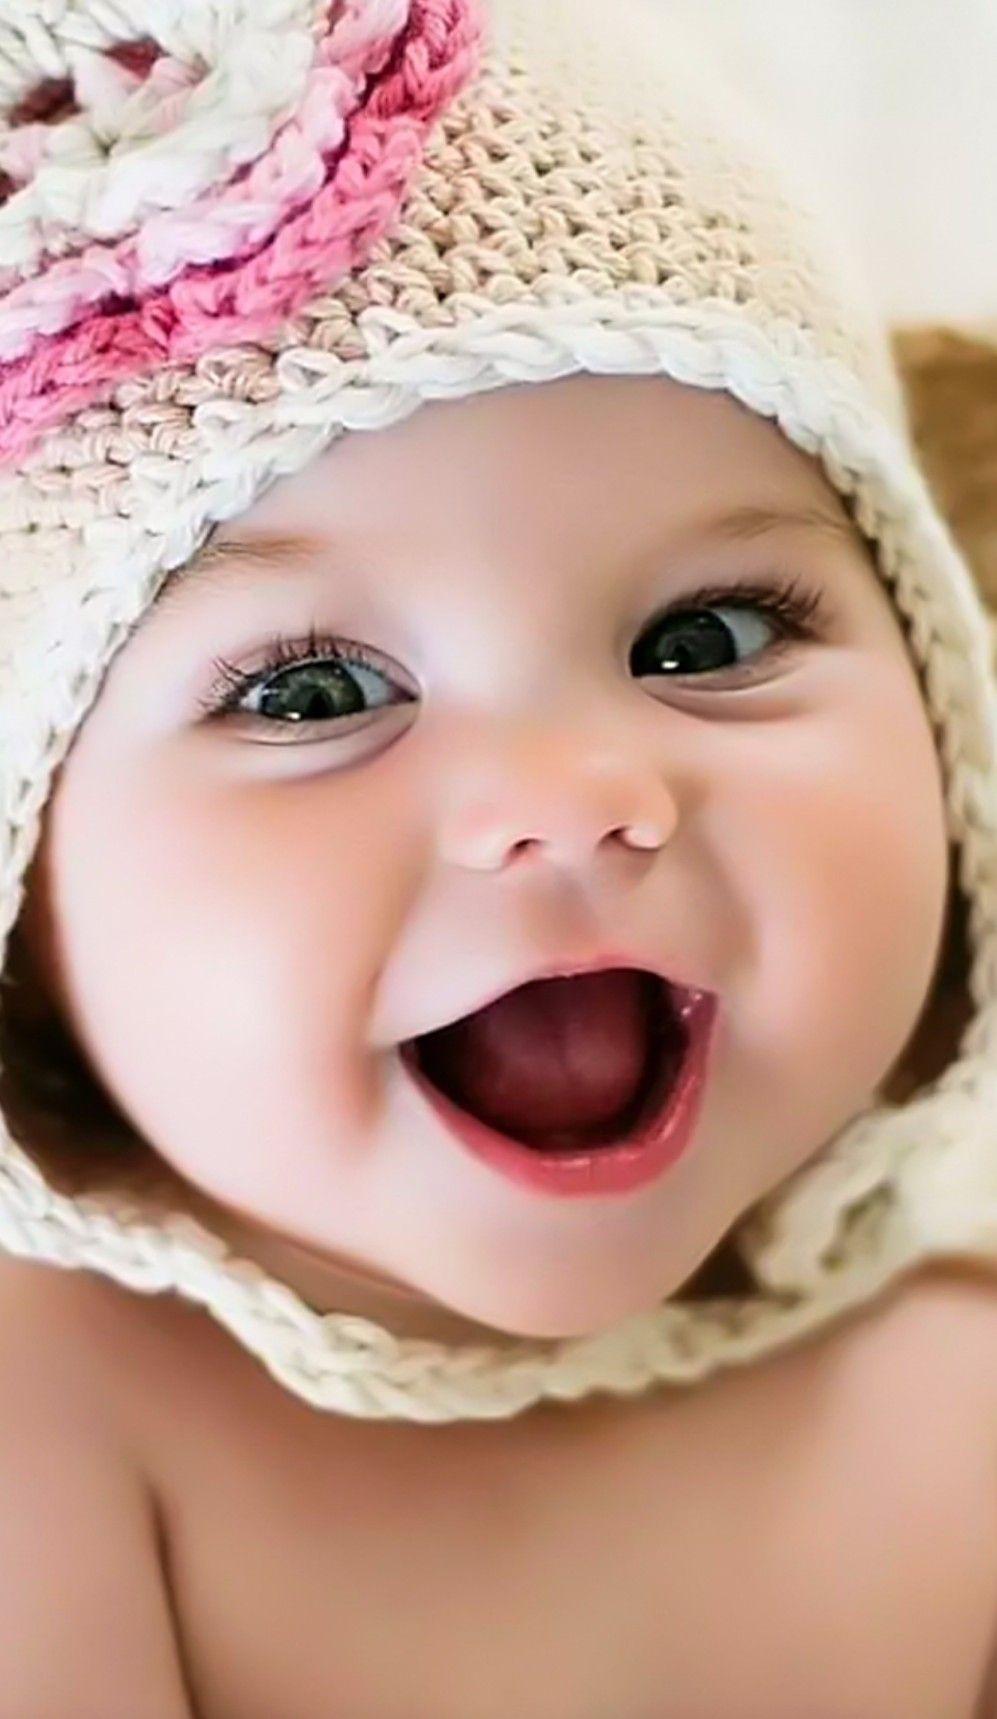 pinshalini jain on sweet cute kiddo | pinterest | babies, child